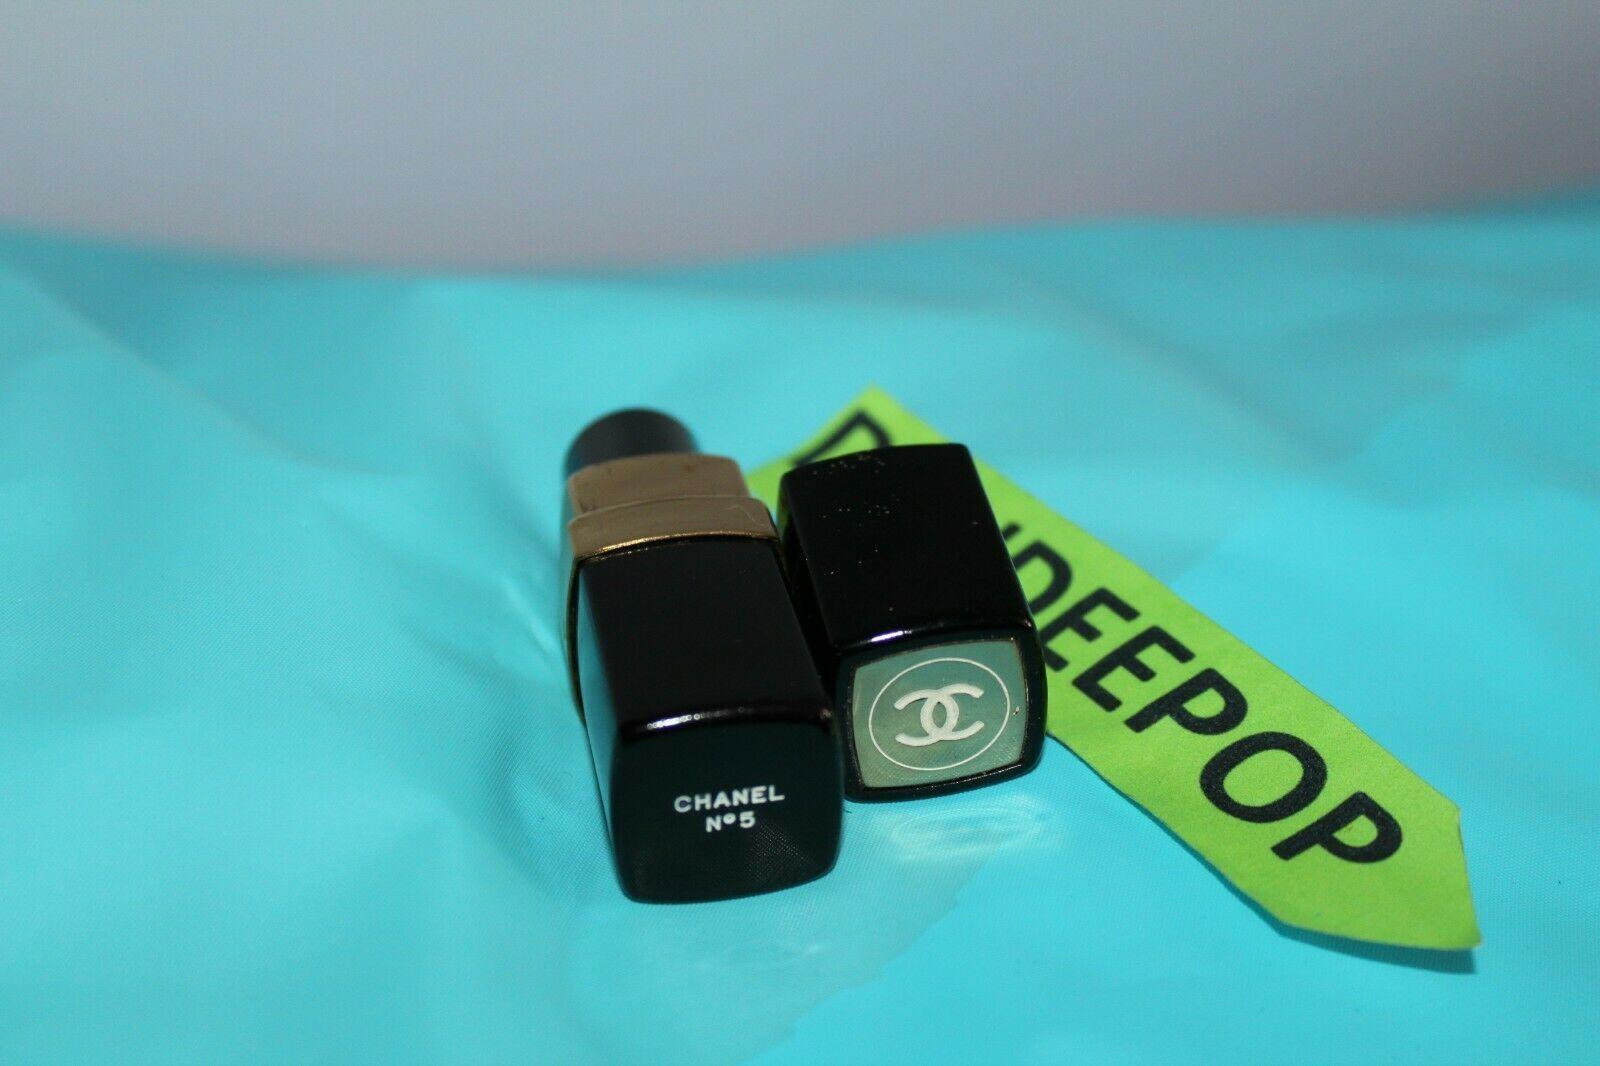 Chanel No. 5 Mini Perfume Vintage Classic image 4